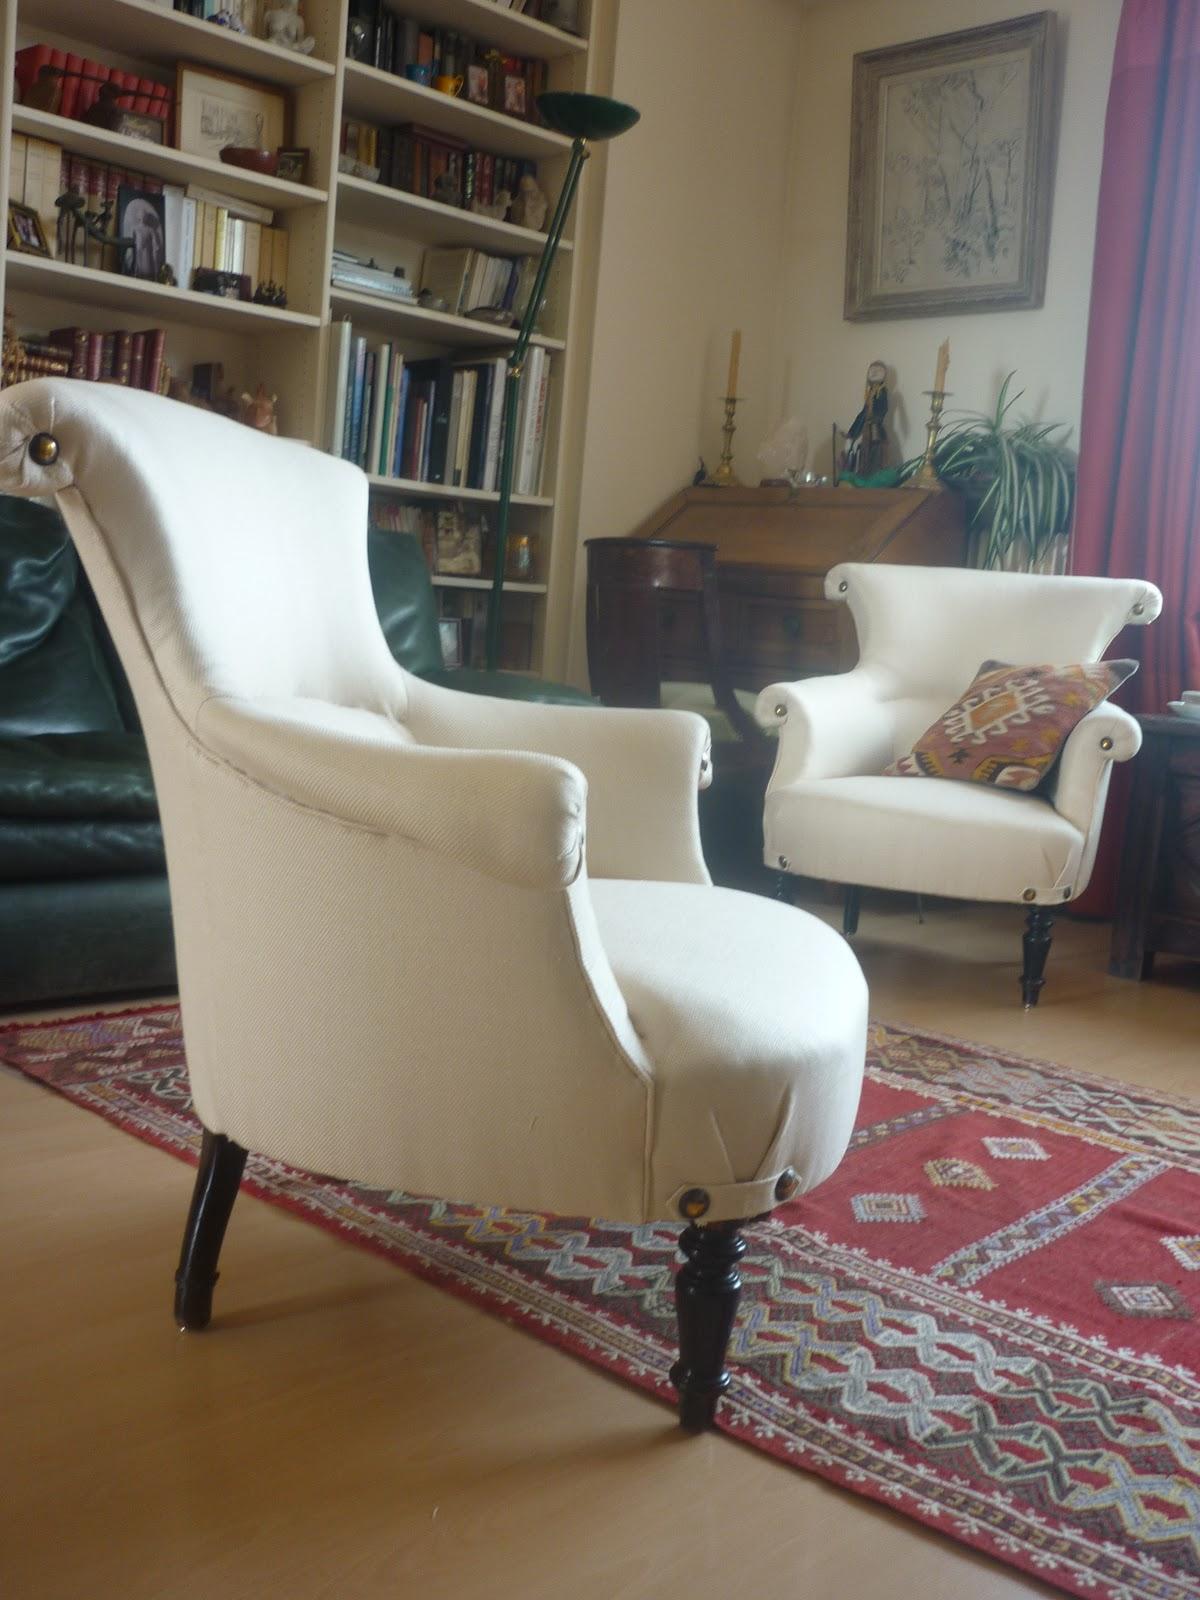 fauteuil napolon iii lambrequin - Fauteuil Napoleon 3